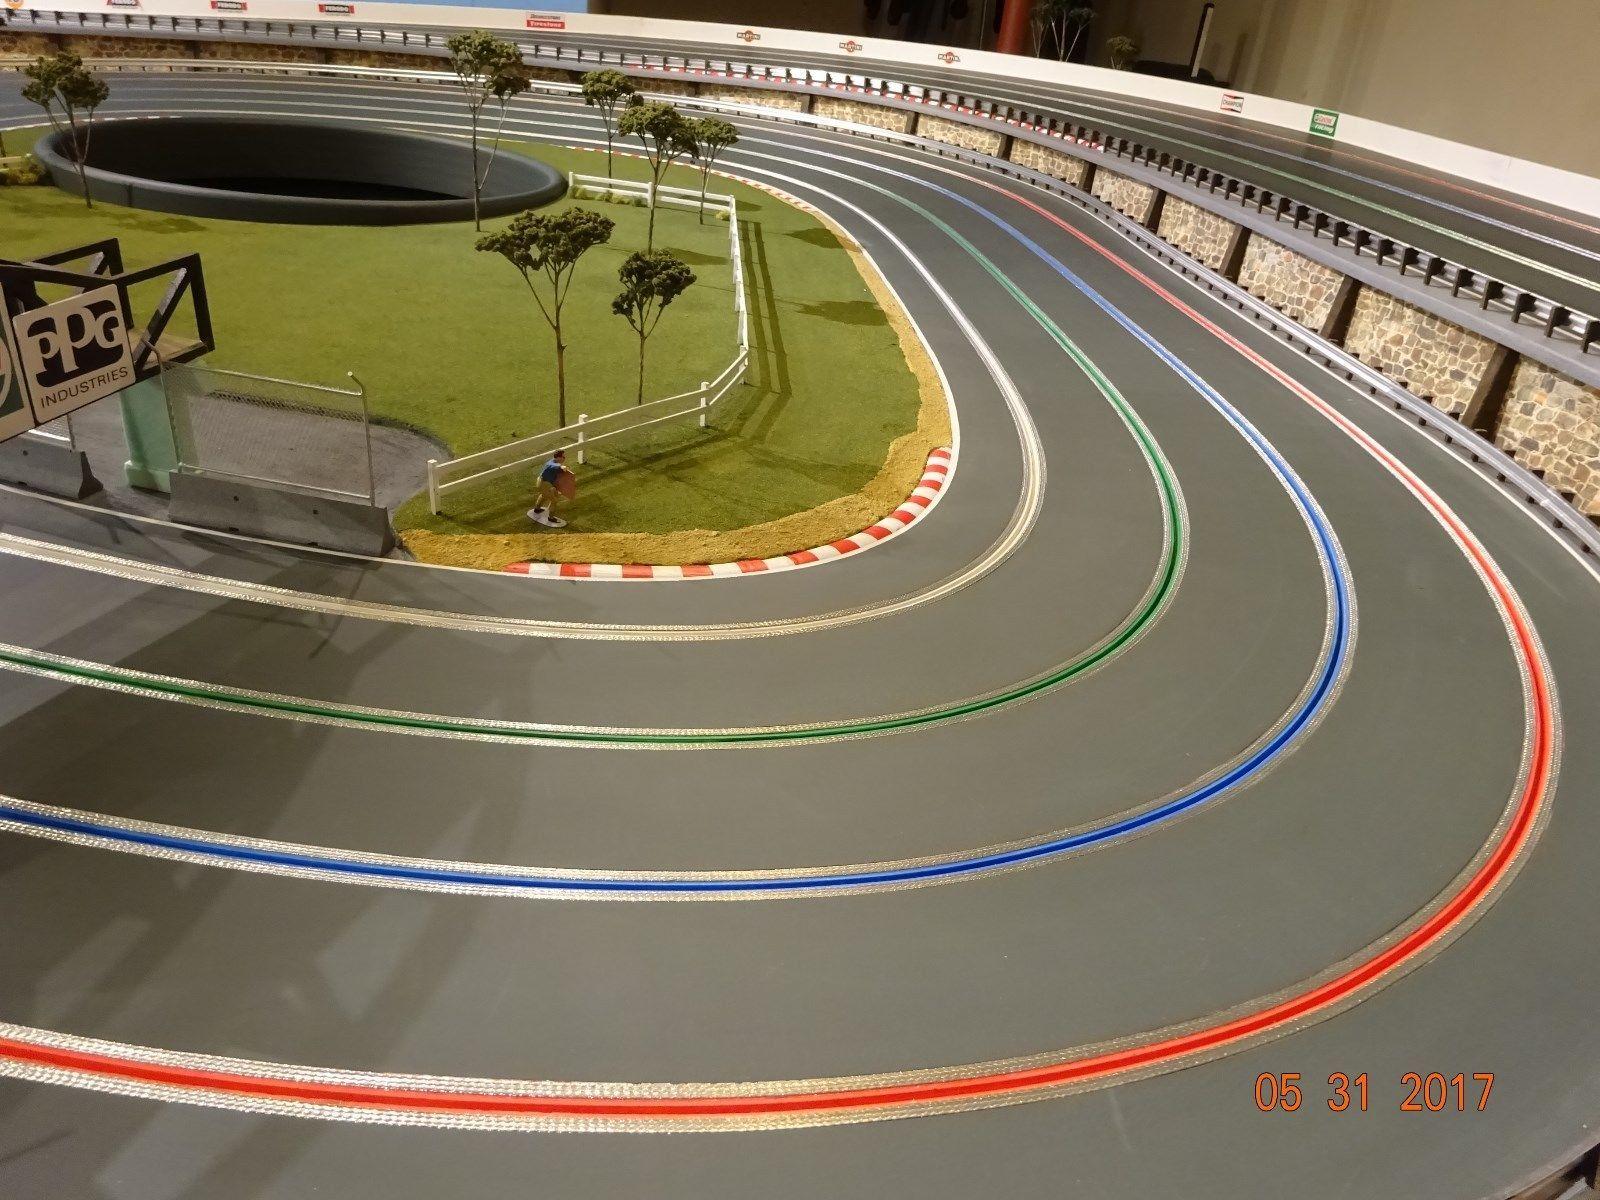 1 32 Scale Aluminum Armco Guardrail System Slot Car Track Diorama Scenery Slot Cars Slot Car Tracks Kids Nutrition